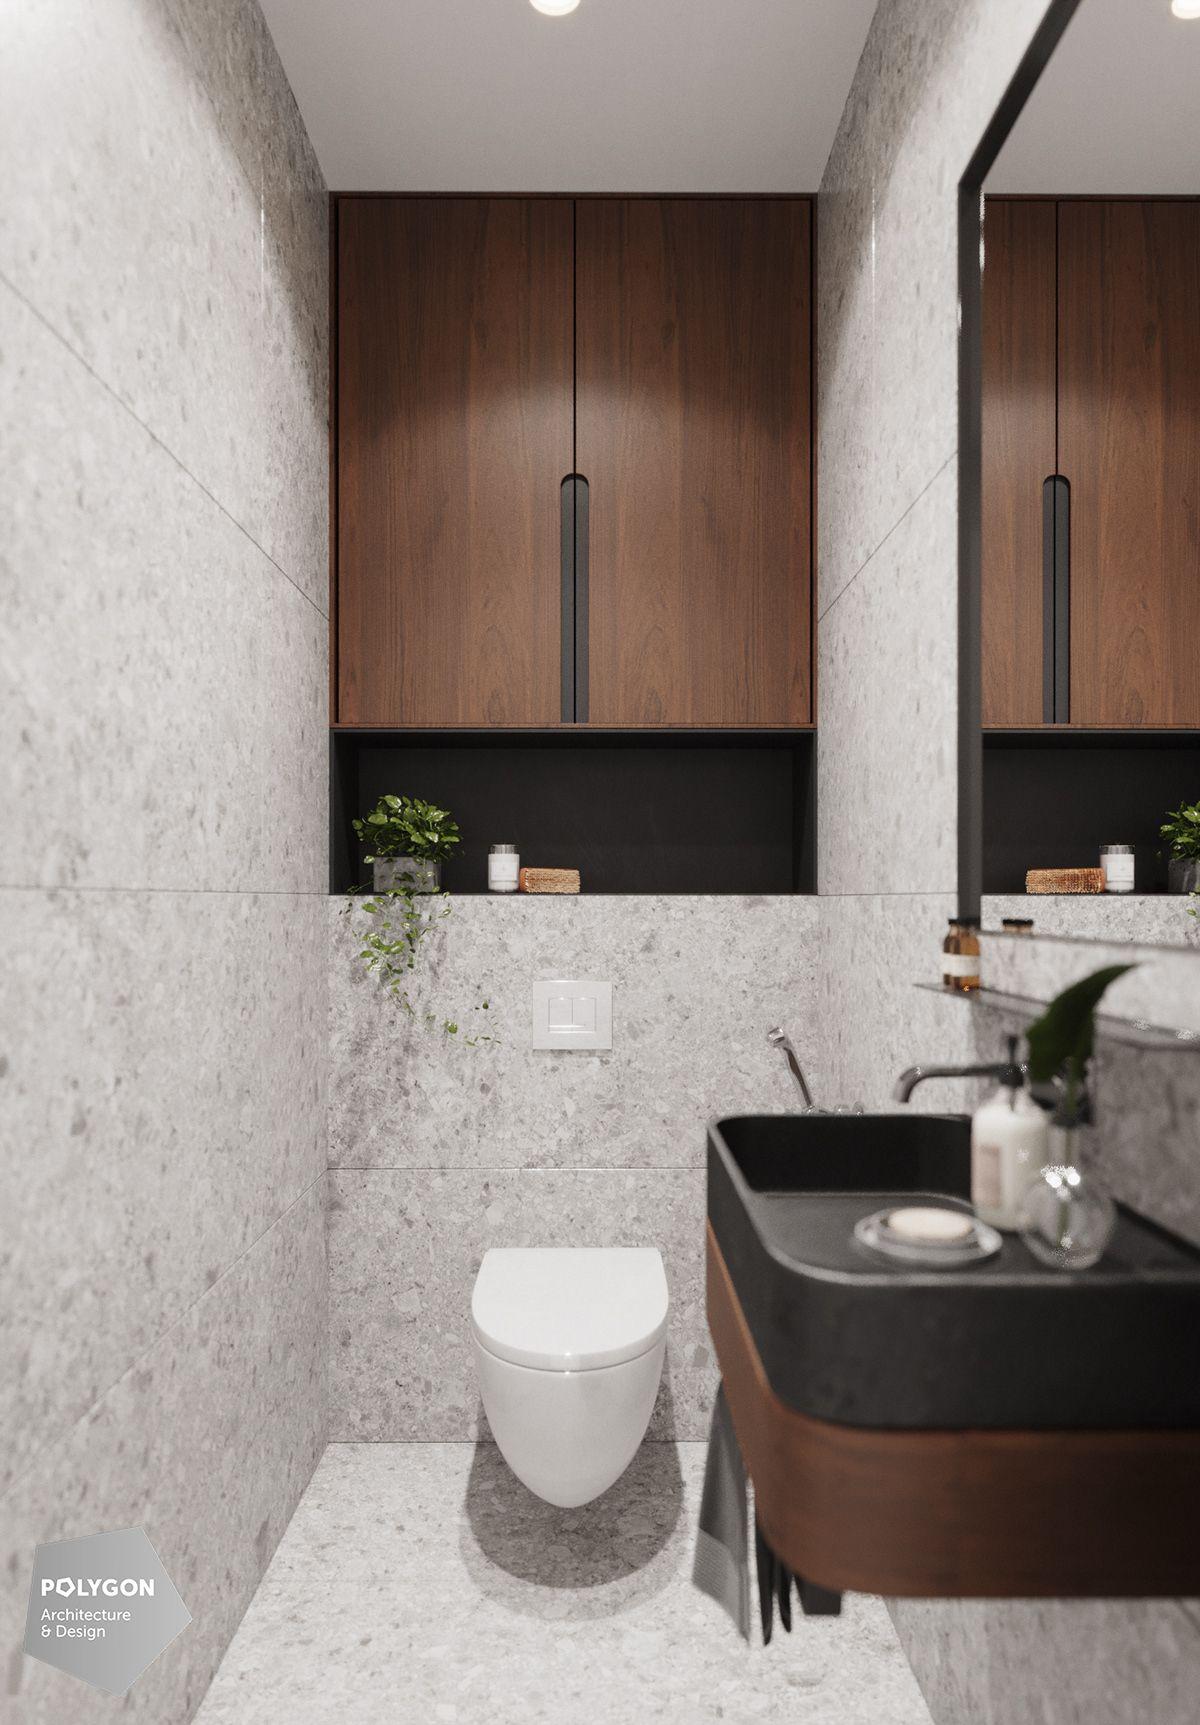 Roma Verbishchuk On Behance Small Toilet Room Architecture Bathroom Stylish Bathroom